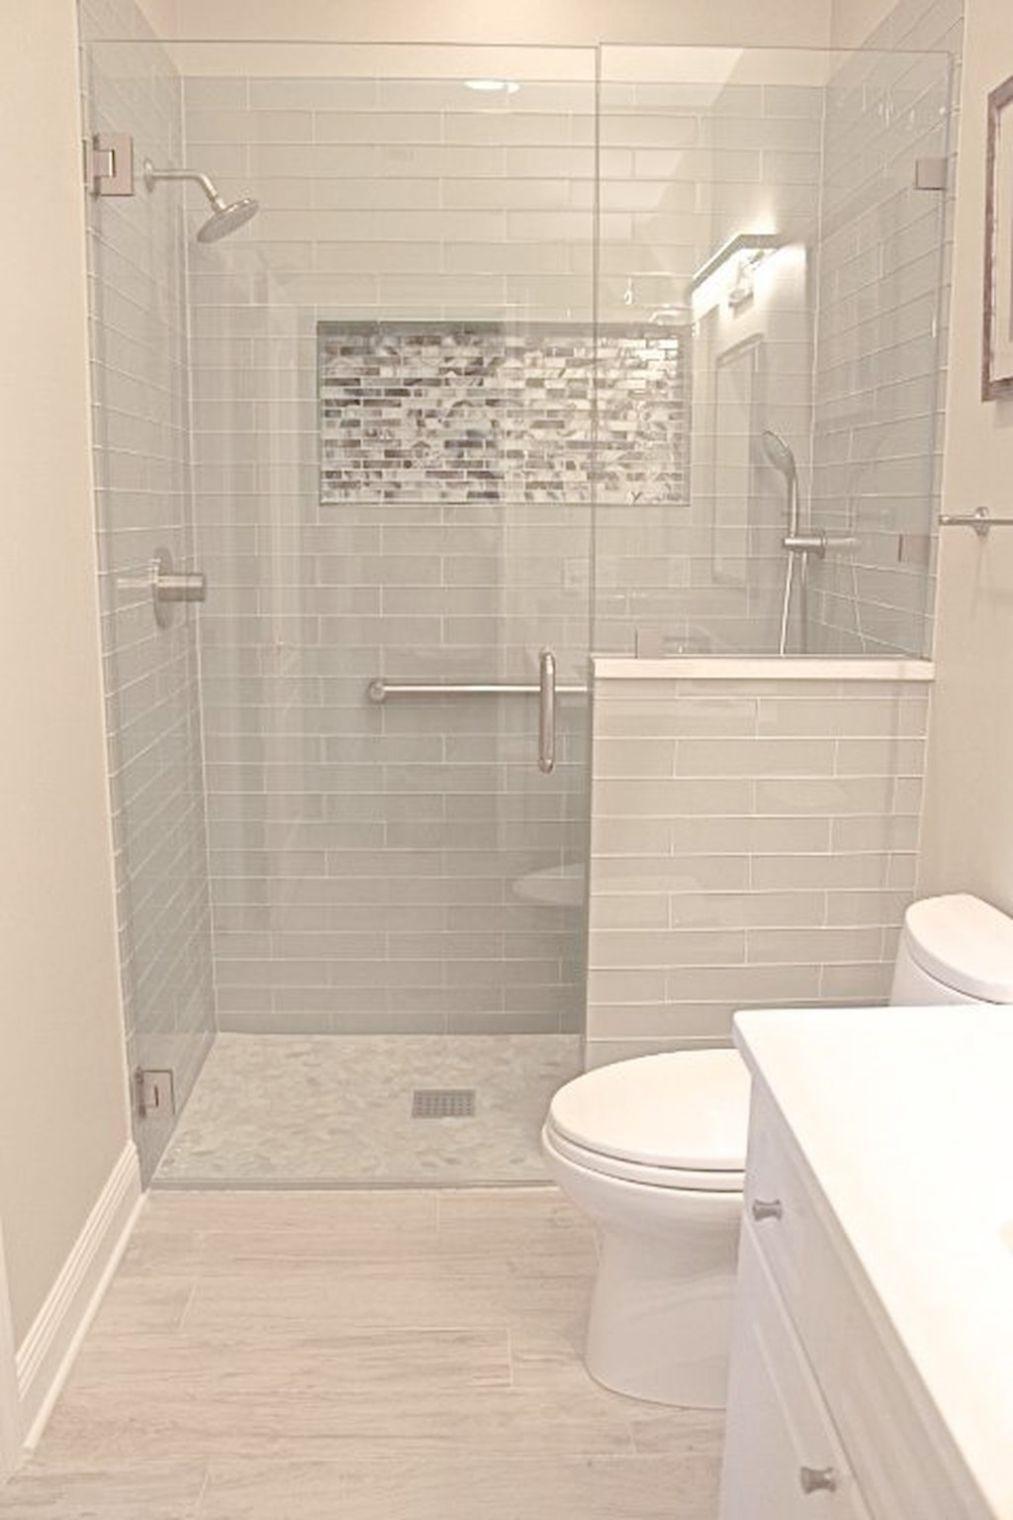 5pcs Bathroom Accessory Set Tumbler Soap Dish Liquid Soap Dispenser Toothbrush Holder Grey In 2020 Bathroom Remodel Shower Master Bathroom Renovation